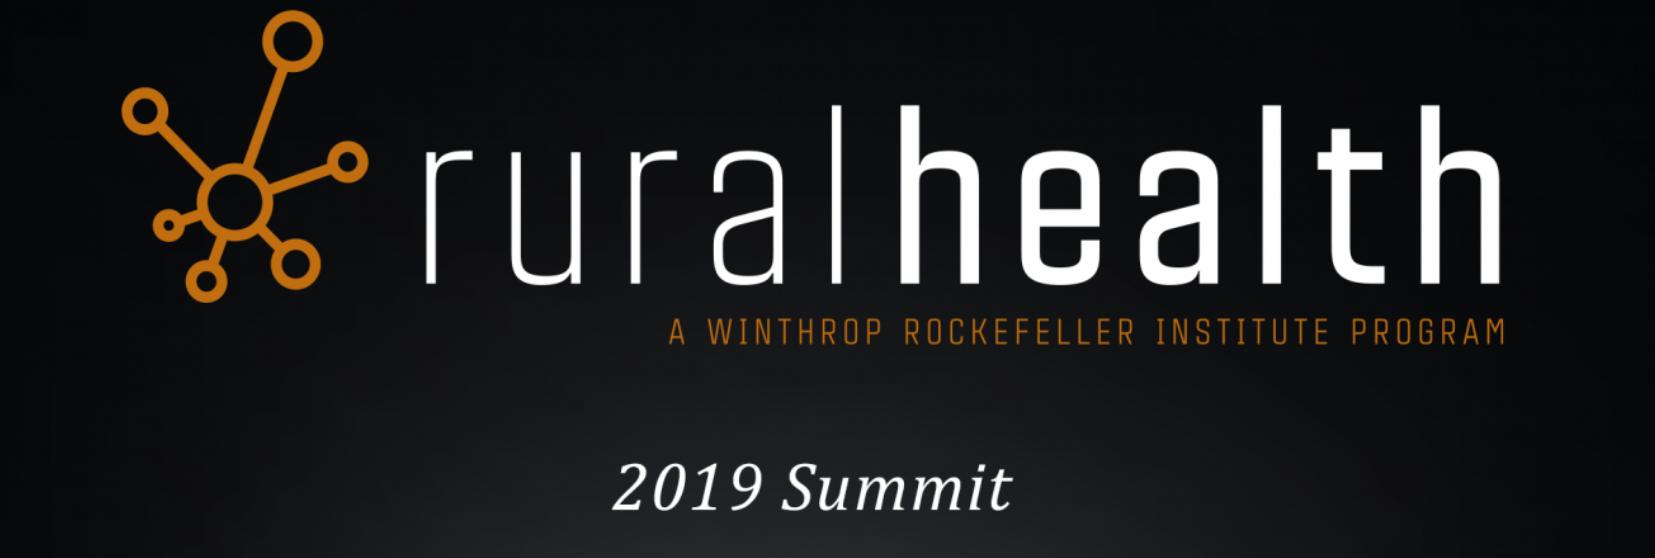 2020 Rural Health Summit, Winthrop Rockefeller Institute (by invitation only)